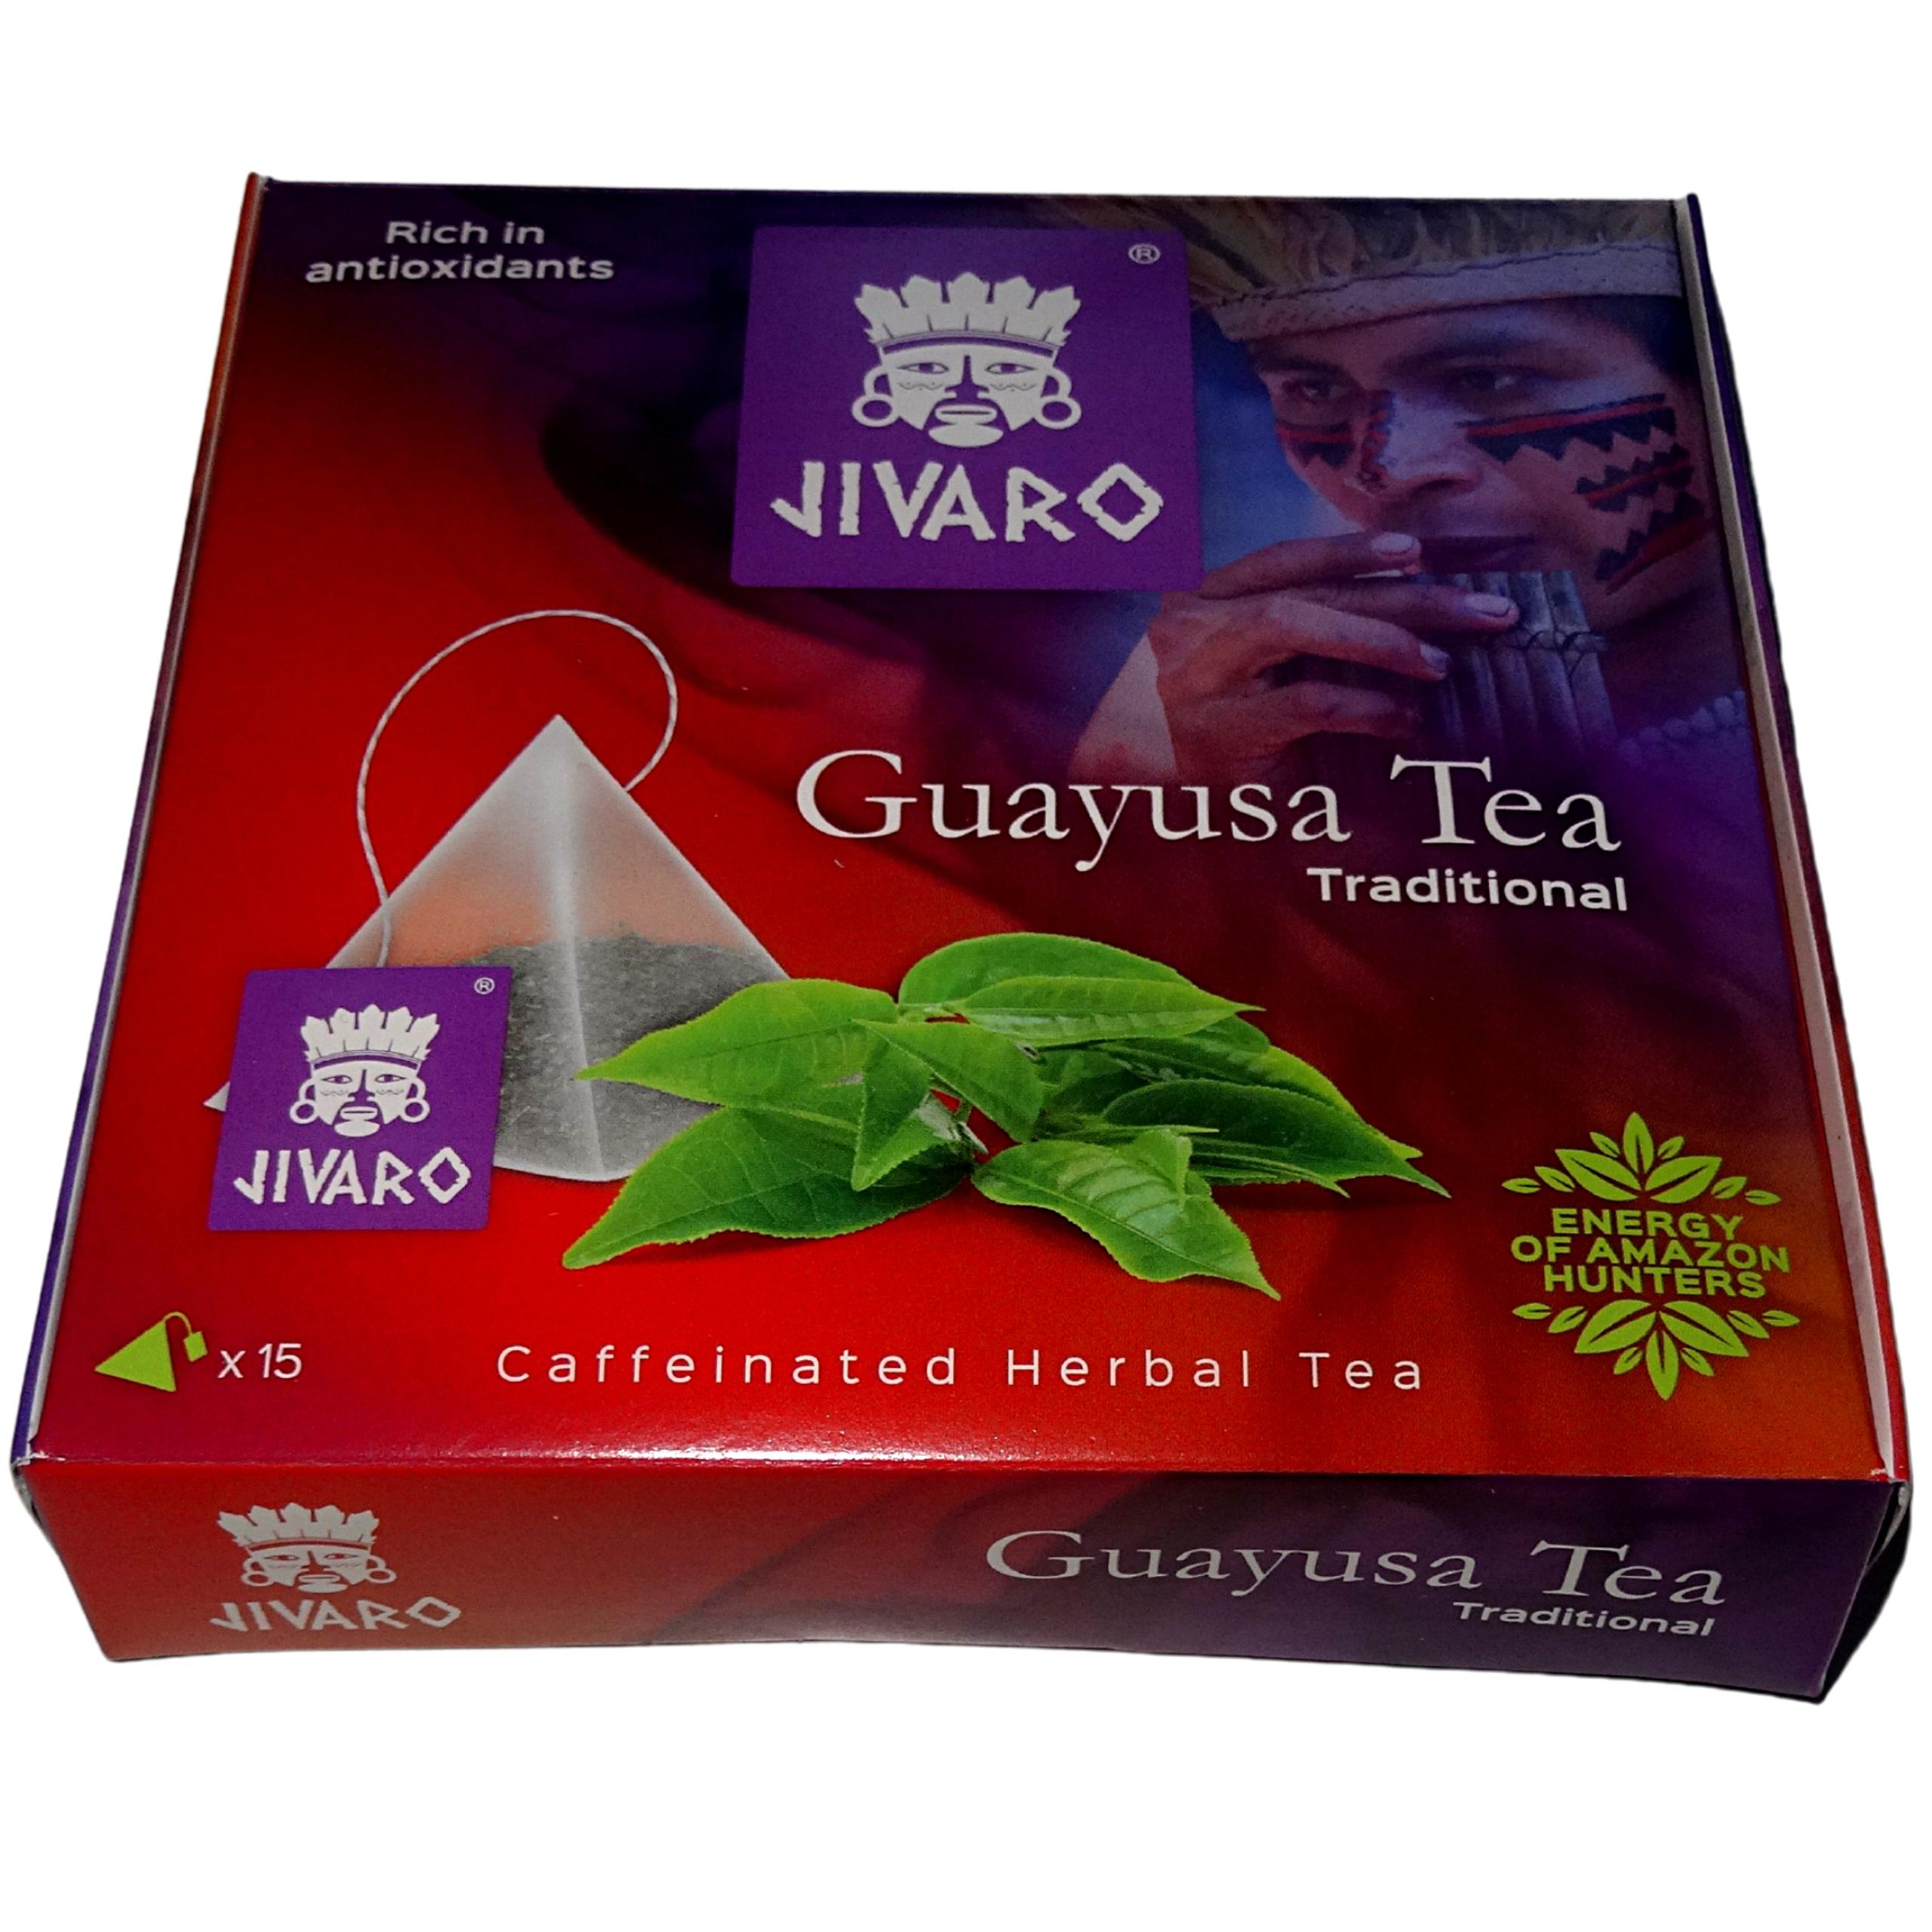 GUAYUSA Herbata JIVARO ZIELONA ENERGIA ENRGIA SLIM Kod producenta 590368-J-SL-O